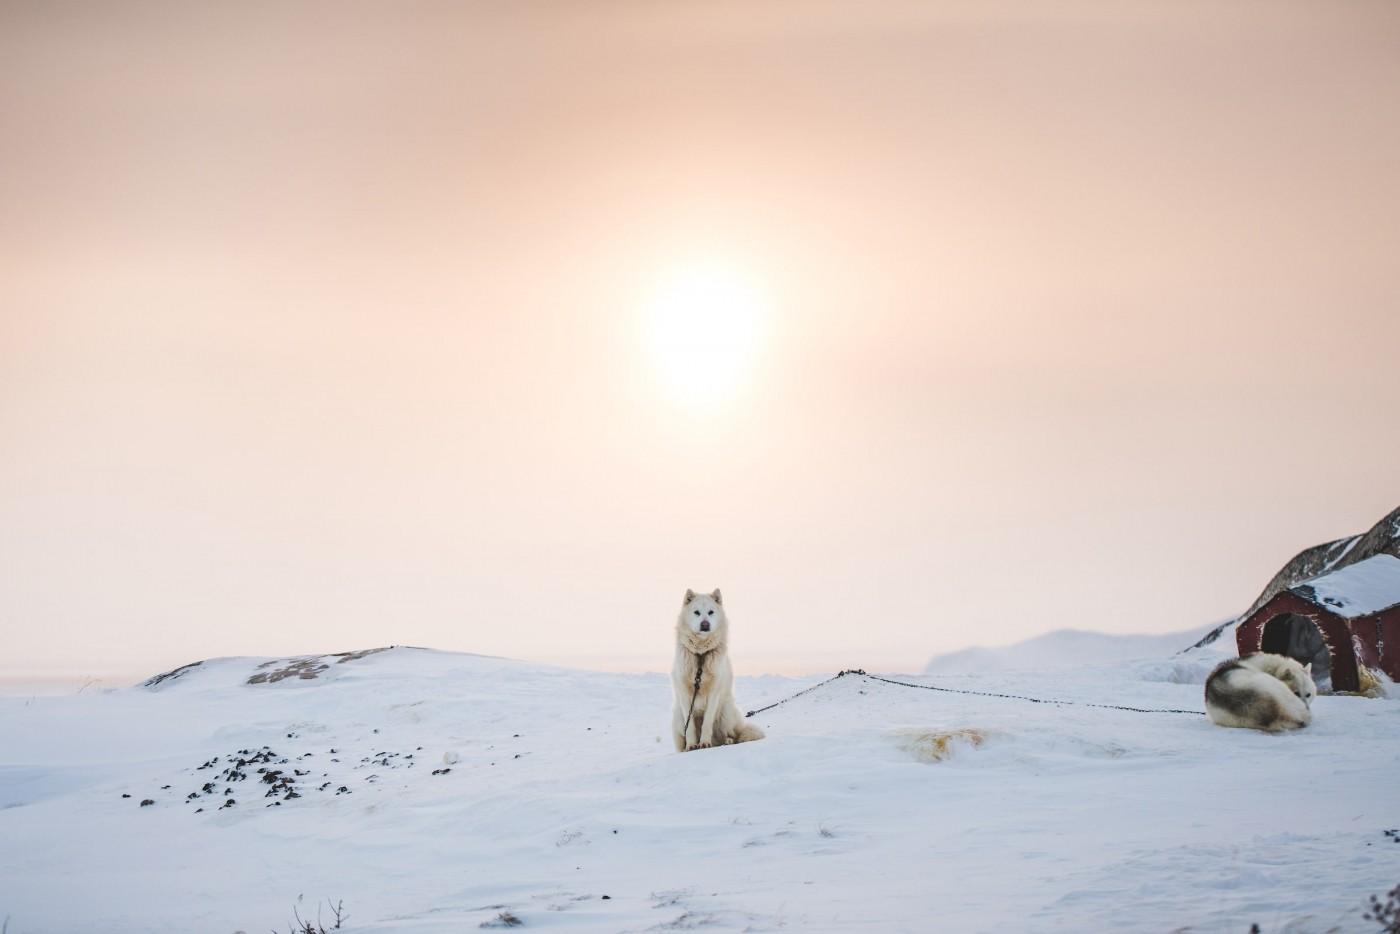 Greenlandic Sled Dog in Soft Sunset Light. Photo by Benjamin Hardman - Visit Greenland